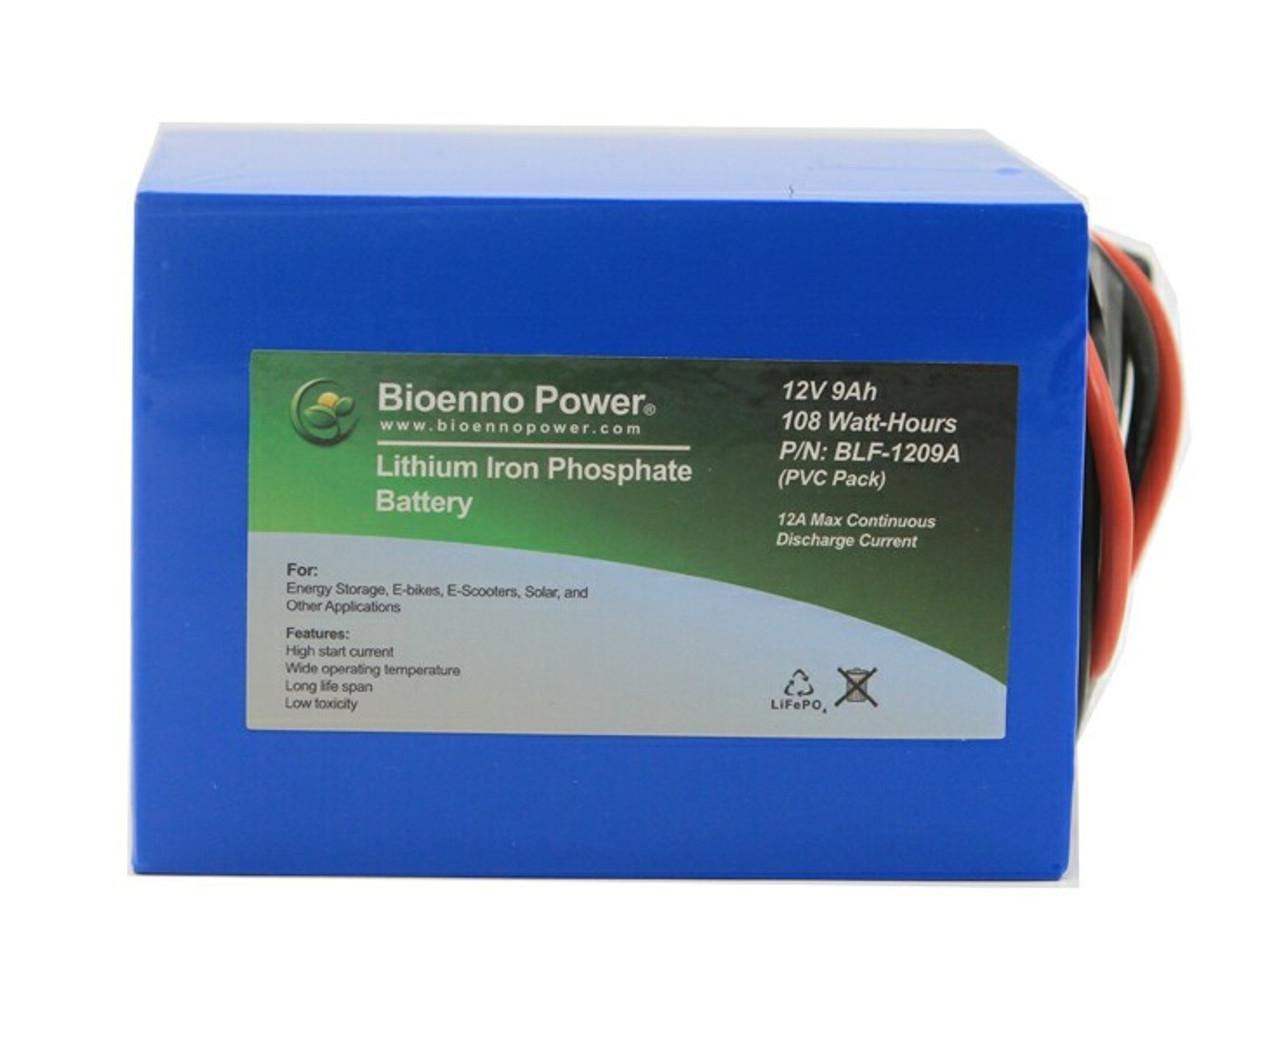 Bioenno Power 12 Volt, 9 Amp Hour Lithium Iron Phosphate Battery